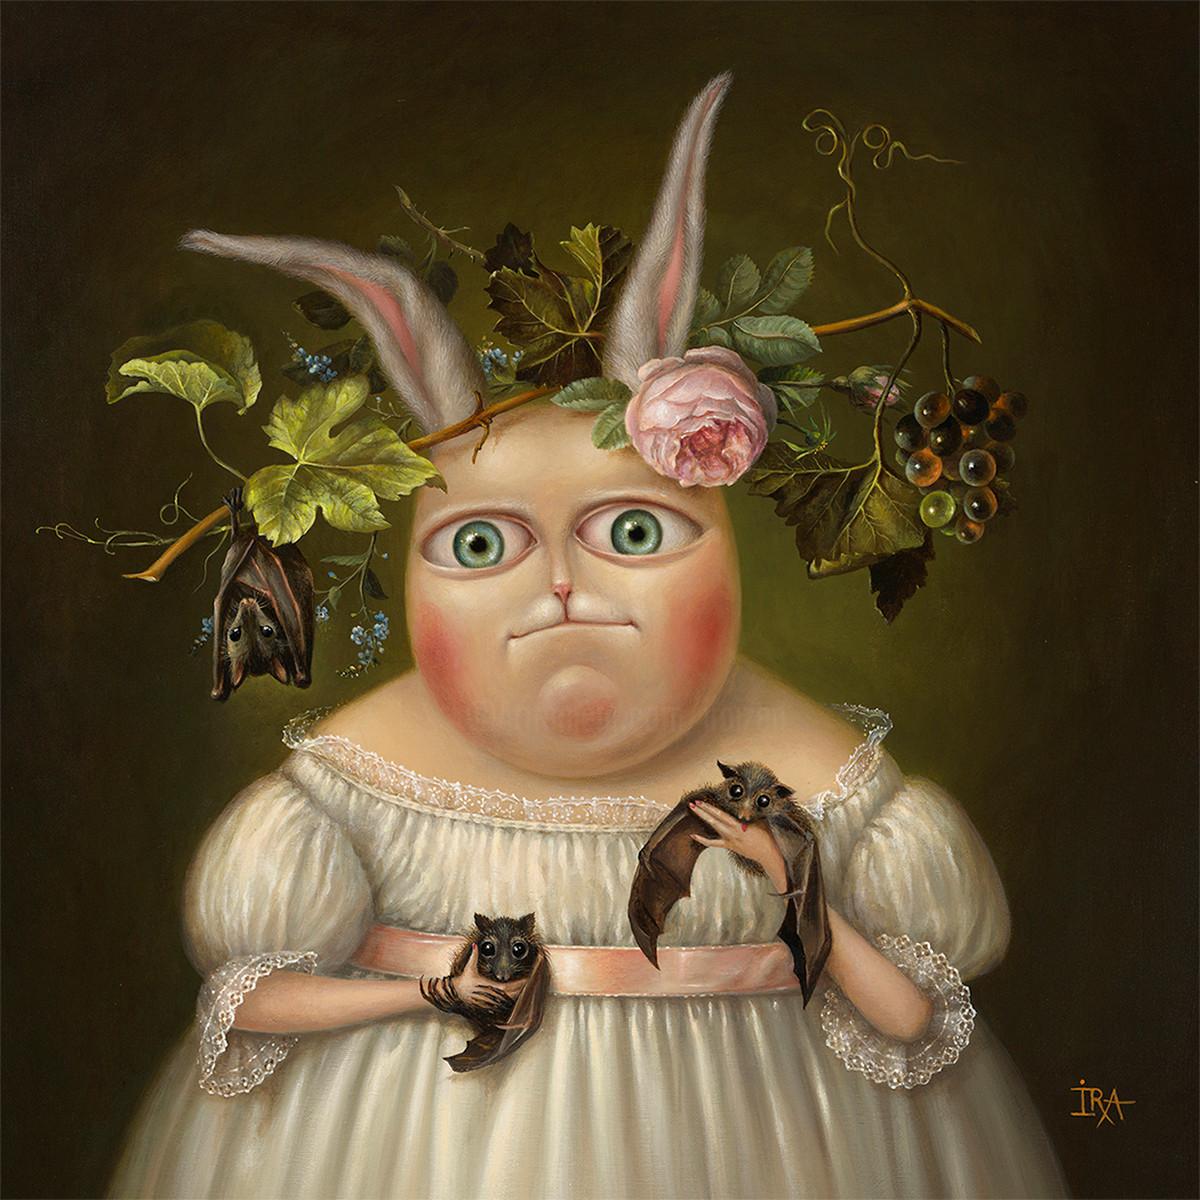 Irena Aizen - Bats-fancier. Fine Art Prints